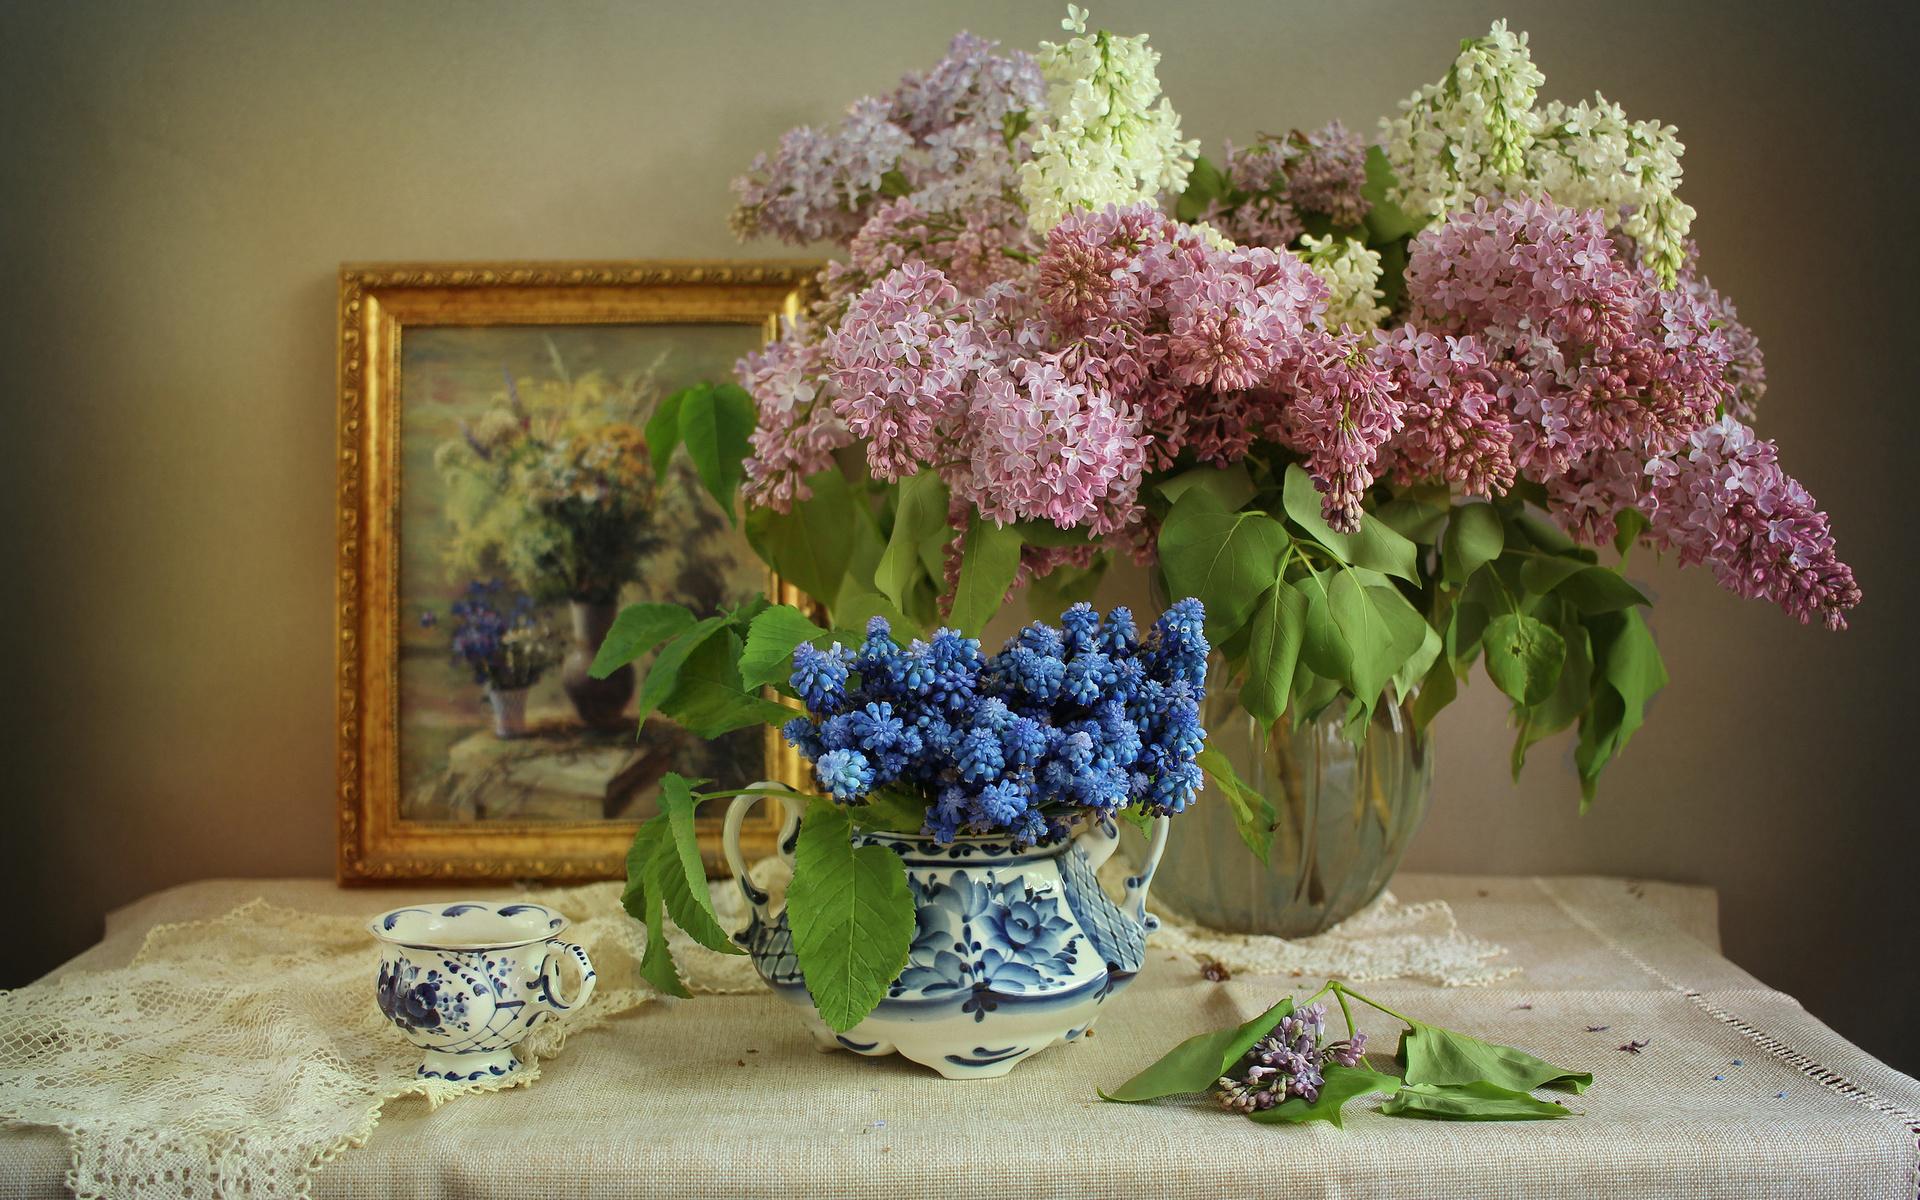 салфетки, ваза, ветки, цветы, сирень, мускари, чашка, картина